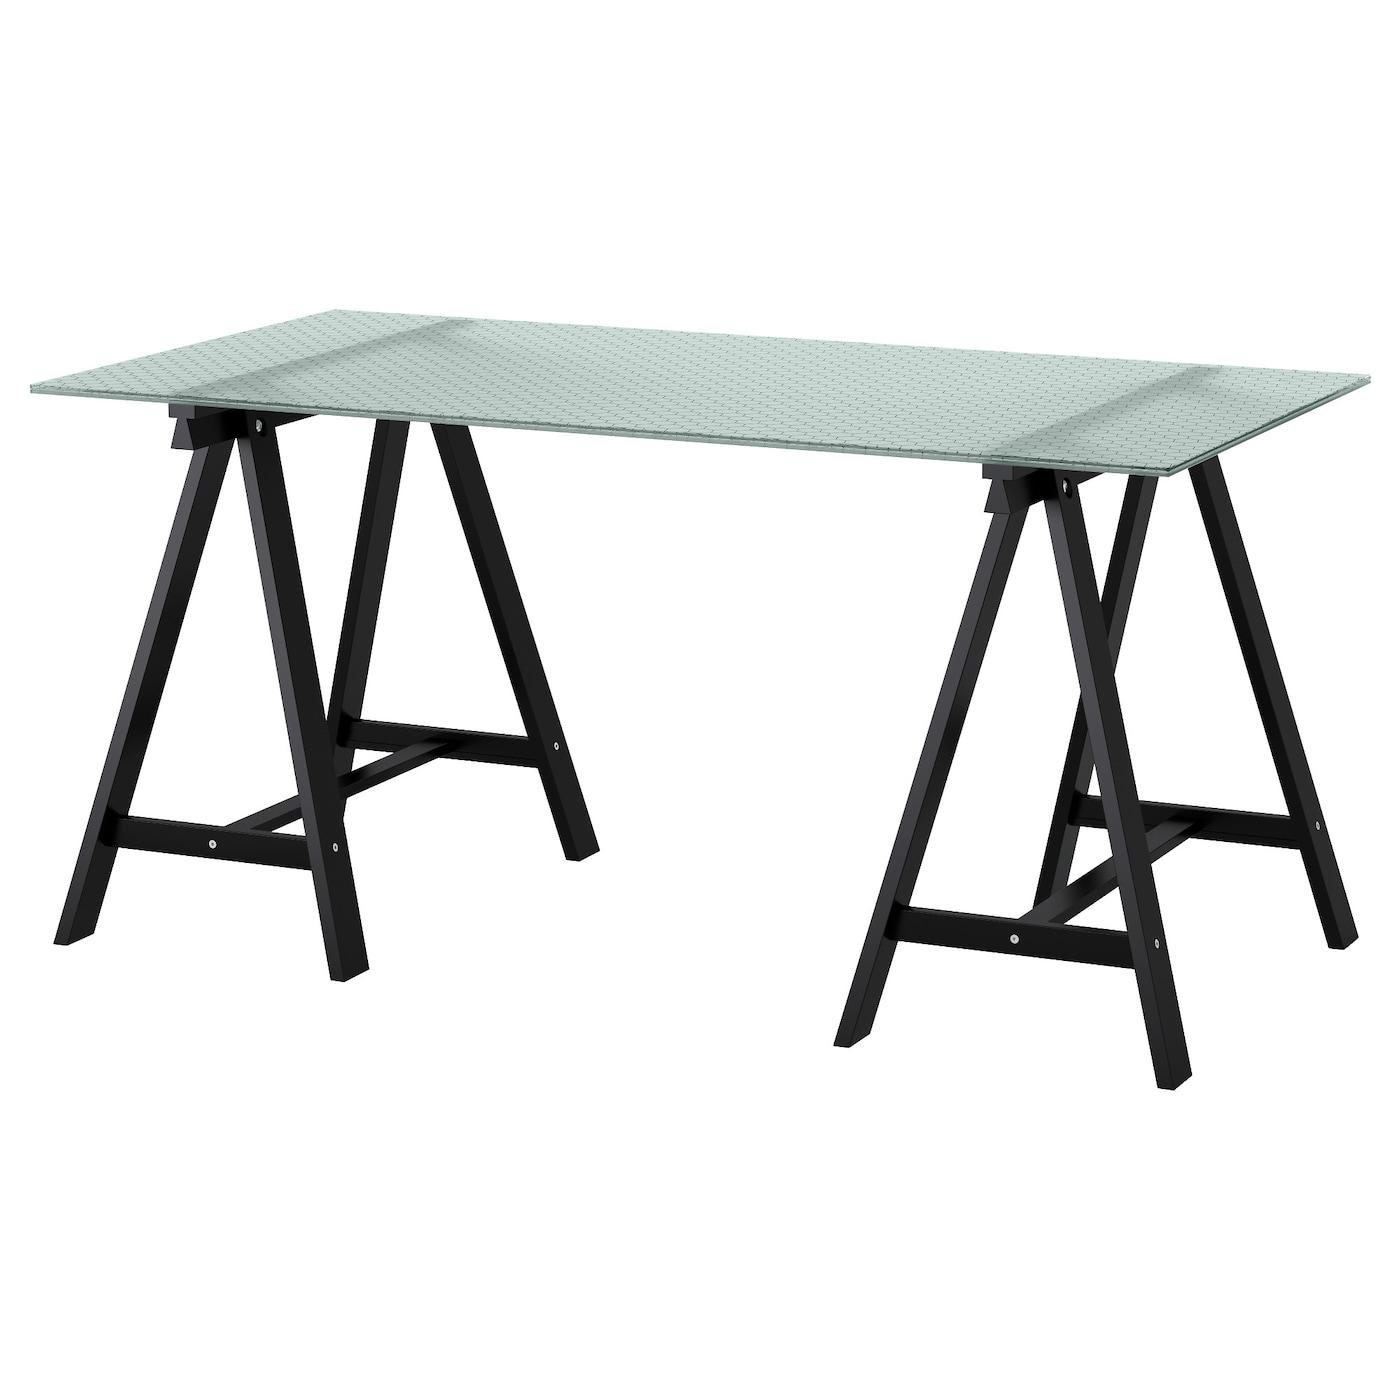 "GLASHOLM / ODDVALD Table - glass/honeycomb pattern black 5 5/5x5 5/5 """